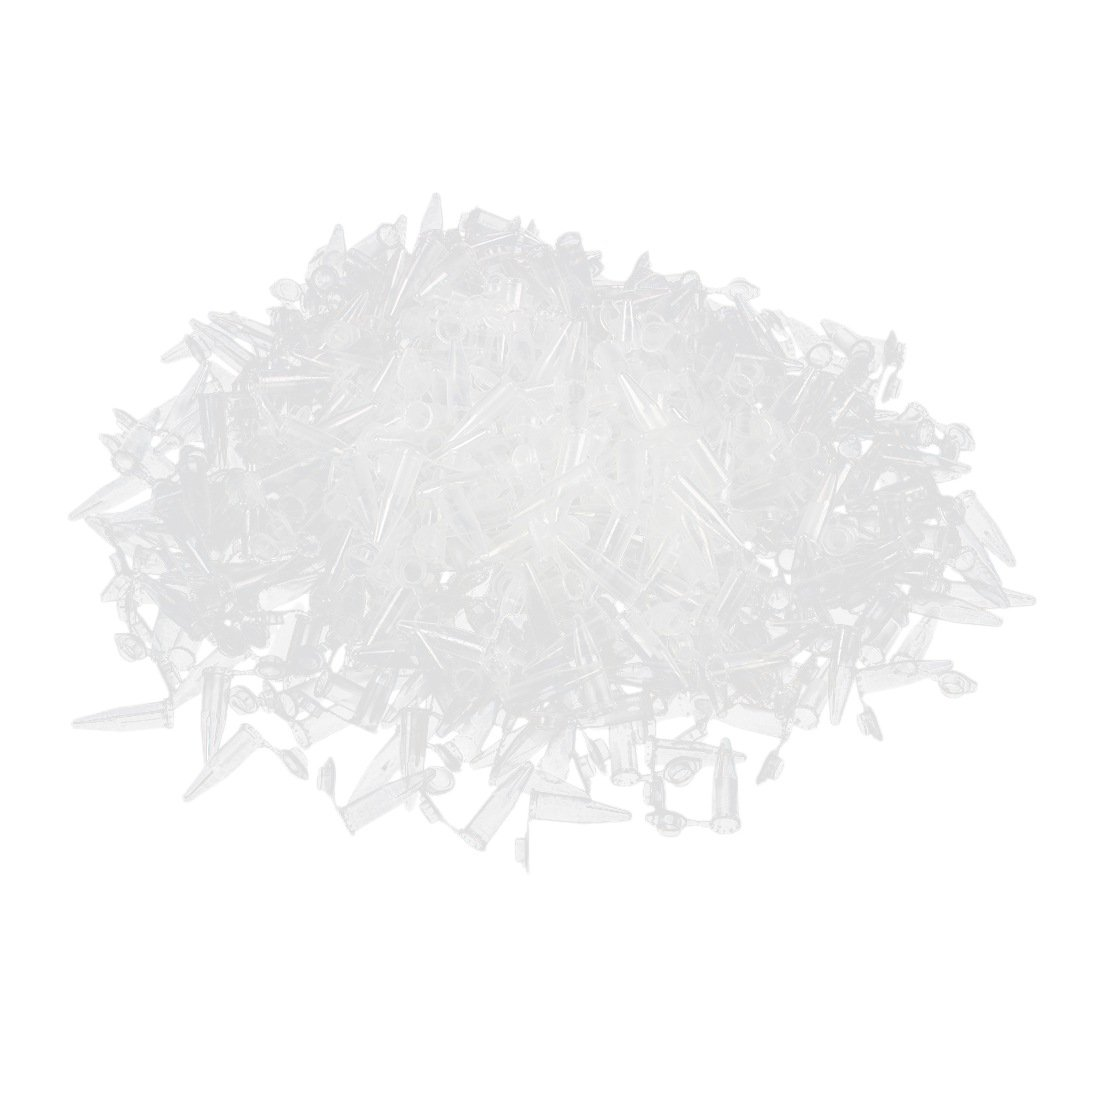 SODIAL(R) 500 Pcs Laboratory Clear White Mark Printed Plastic Centrifuge Tube 1.5ml